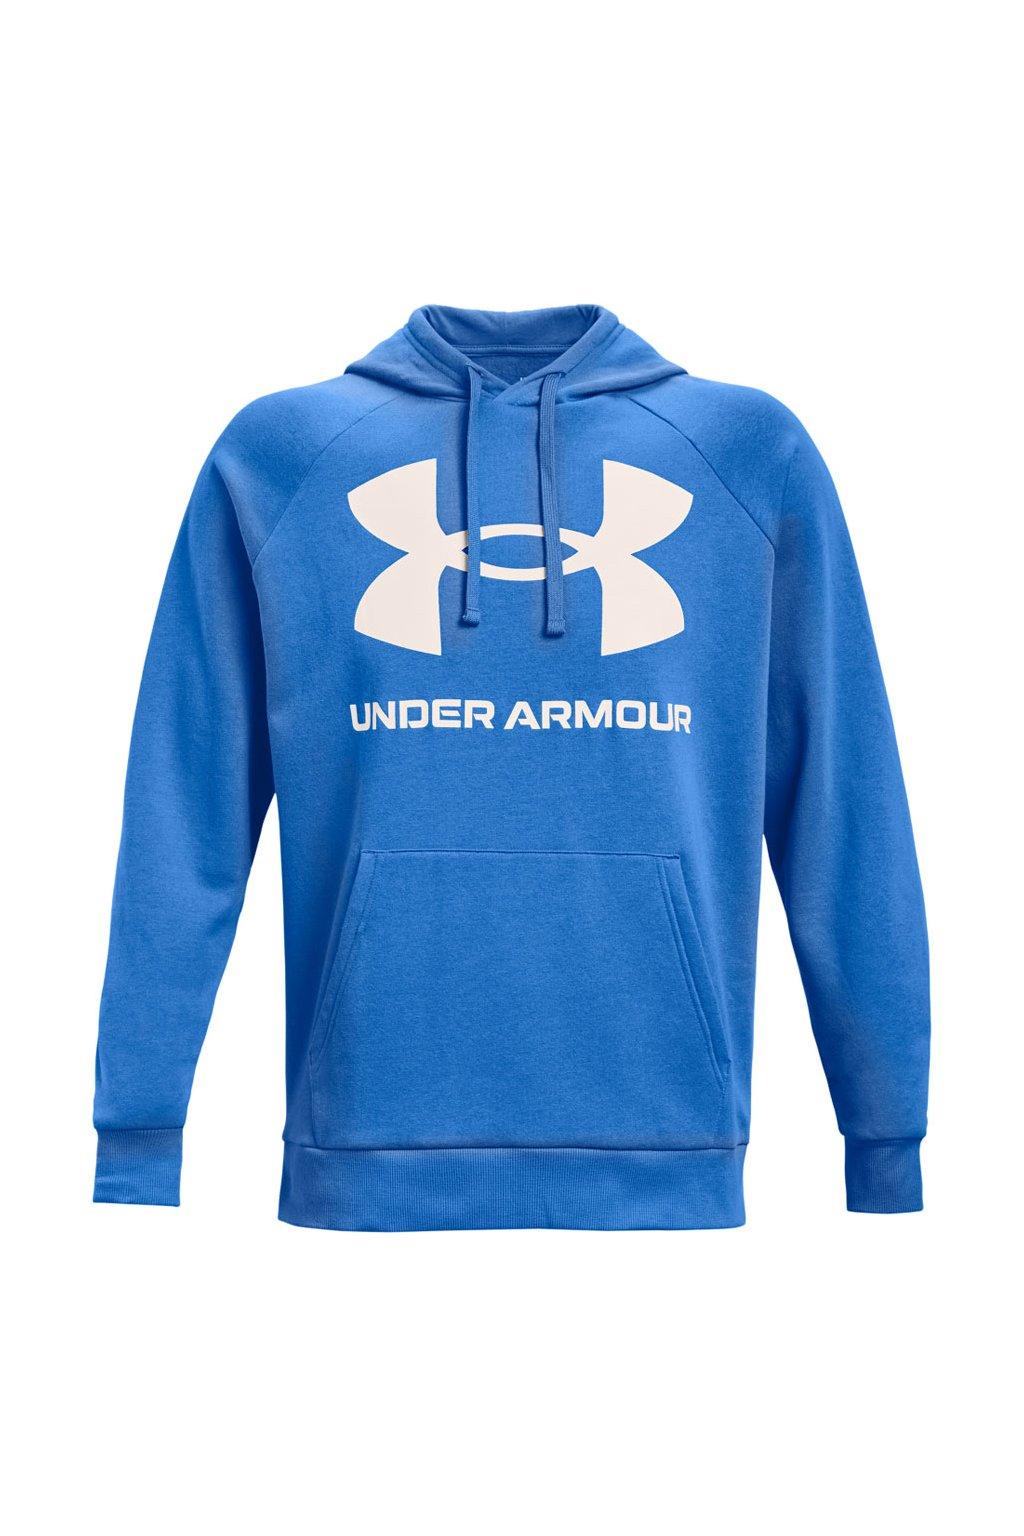 Pánska mikina Under Armour Men's Rival Fleece Big Logo modrá 1357093 787